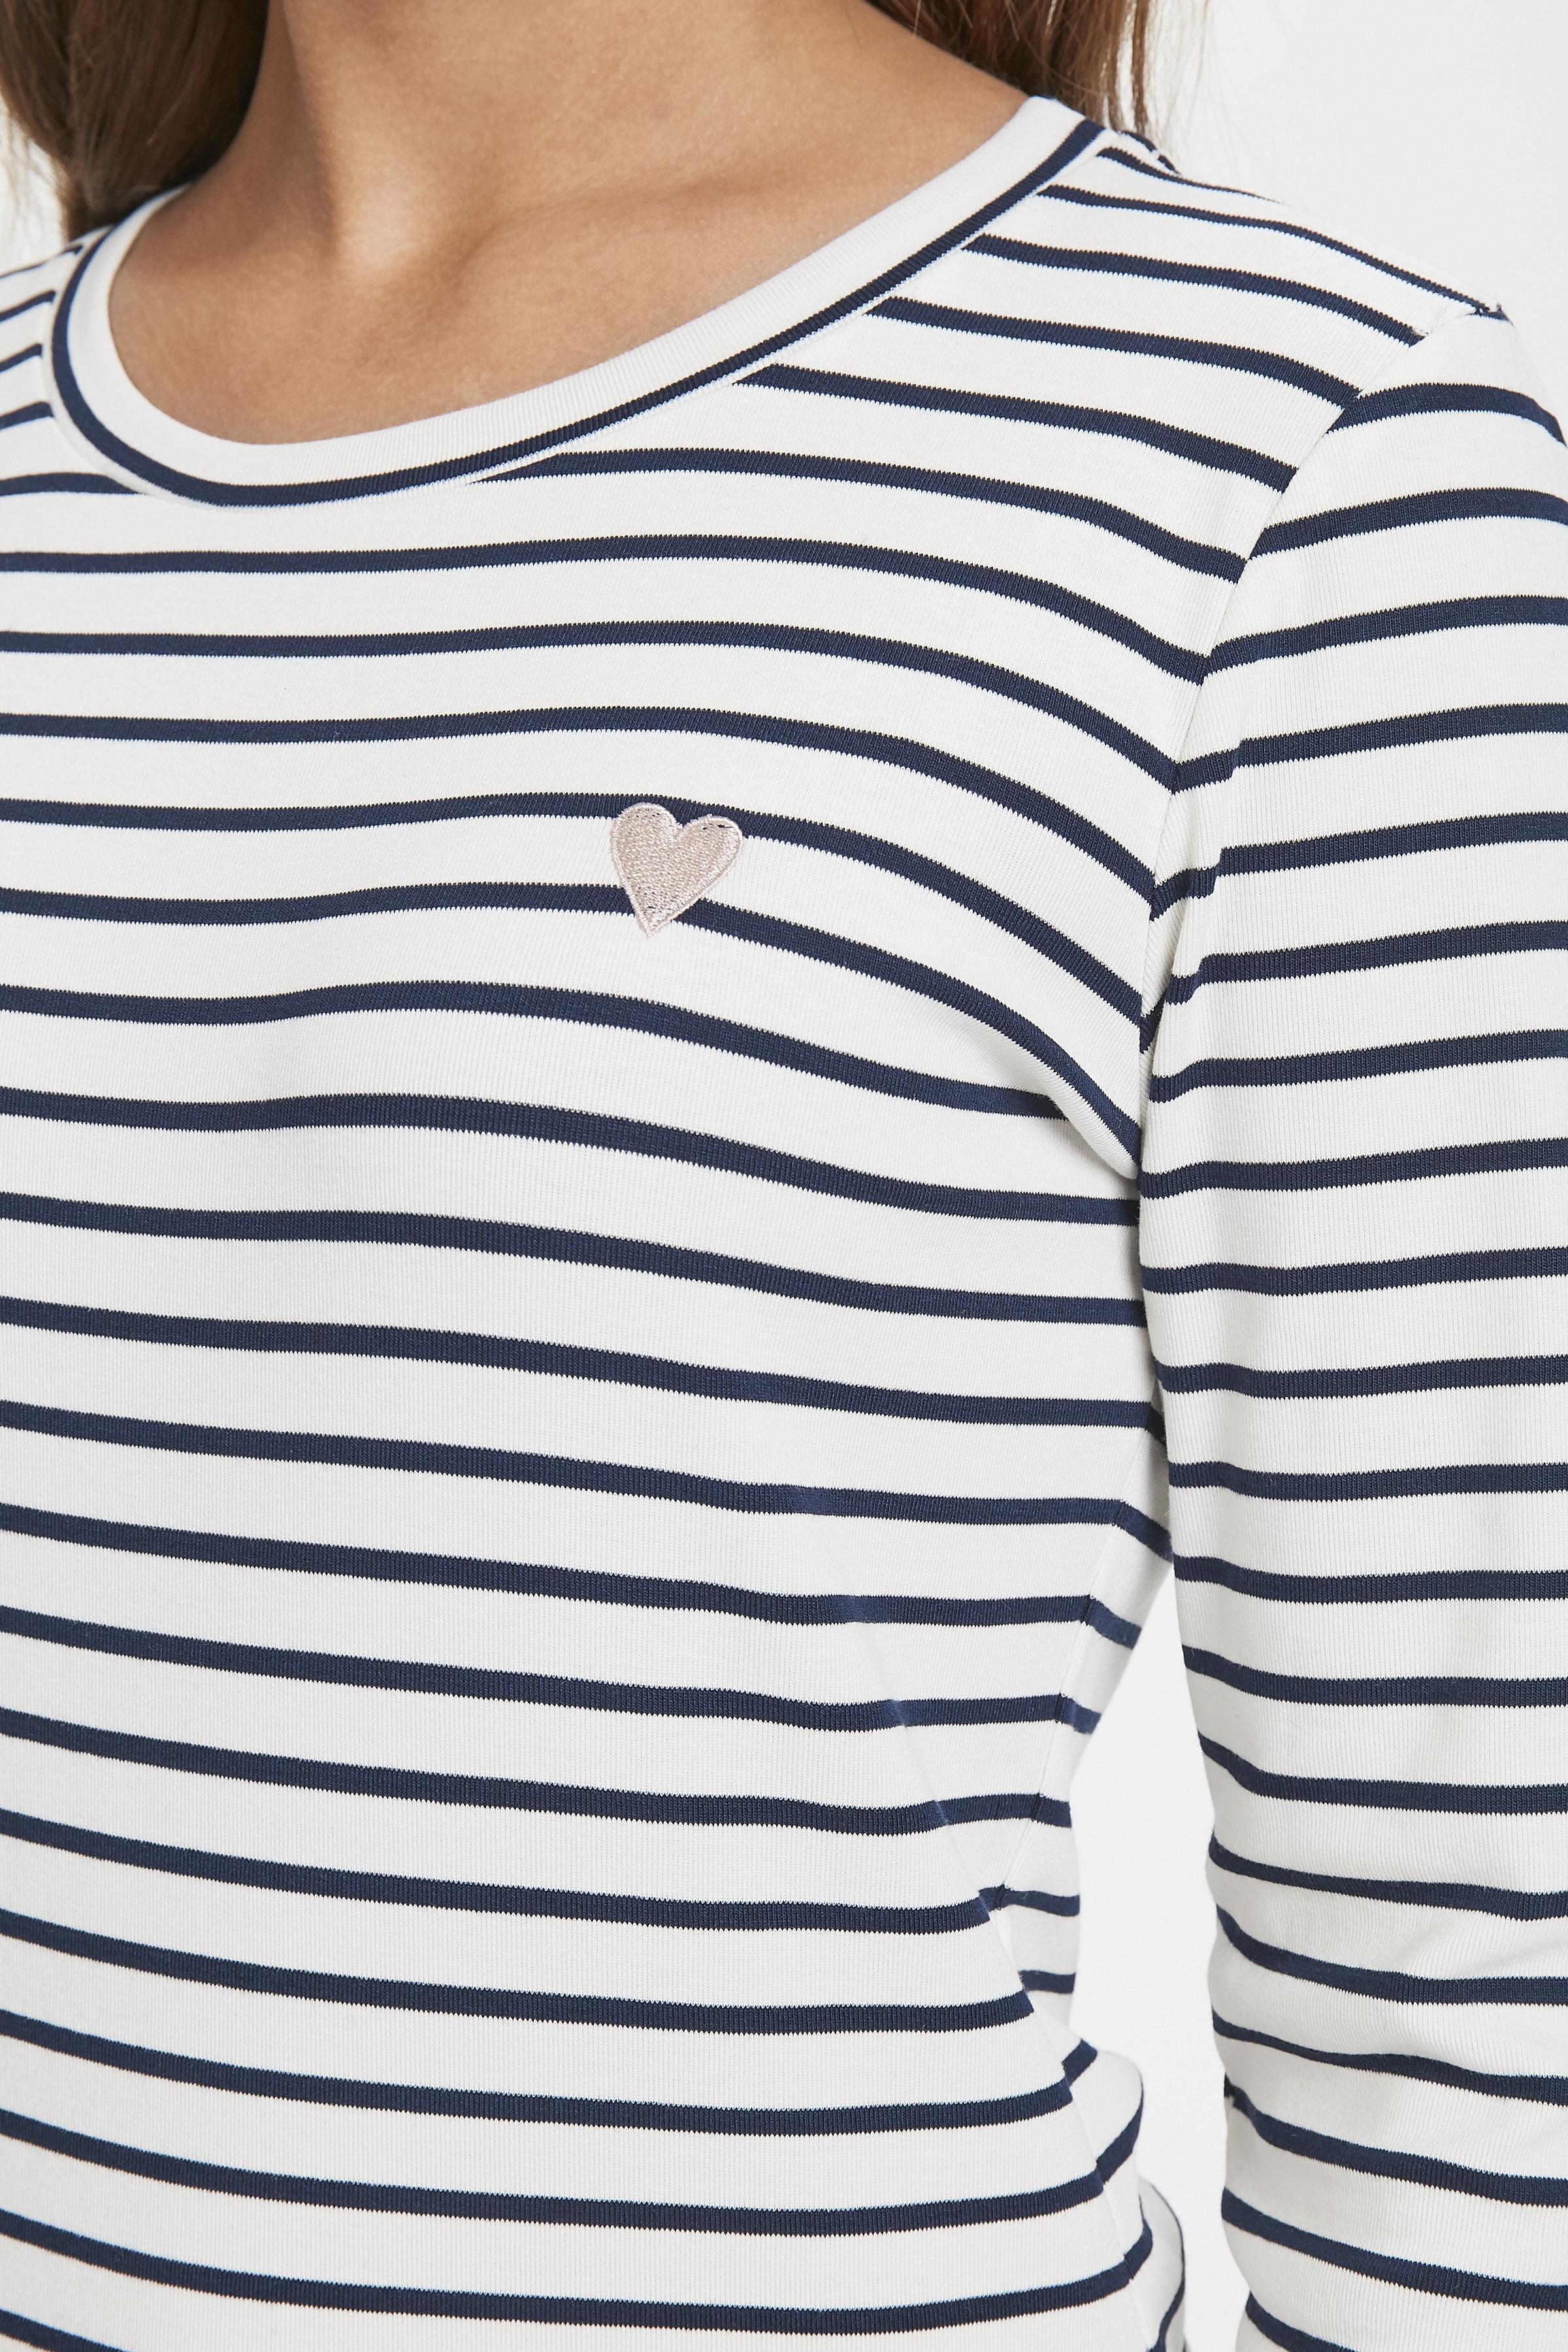 Wollweiss/marineblau Langarm-Bluse  von Kaffe – Shoppen SieWollweiss/marineblau Langarm-Bluse  ab Gr. XS-XXL hier